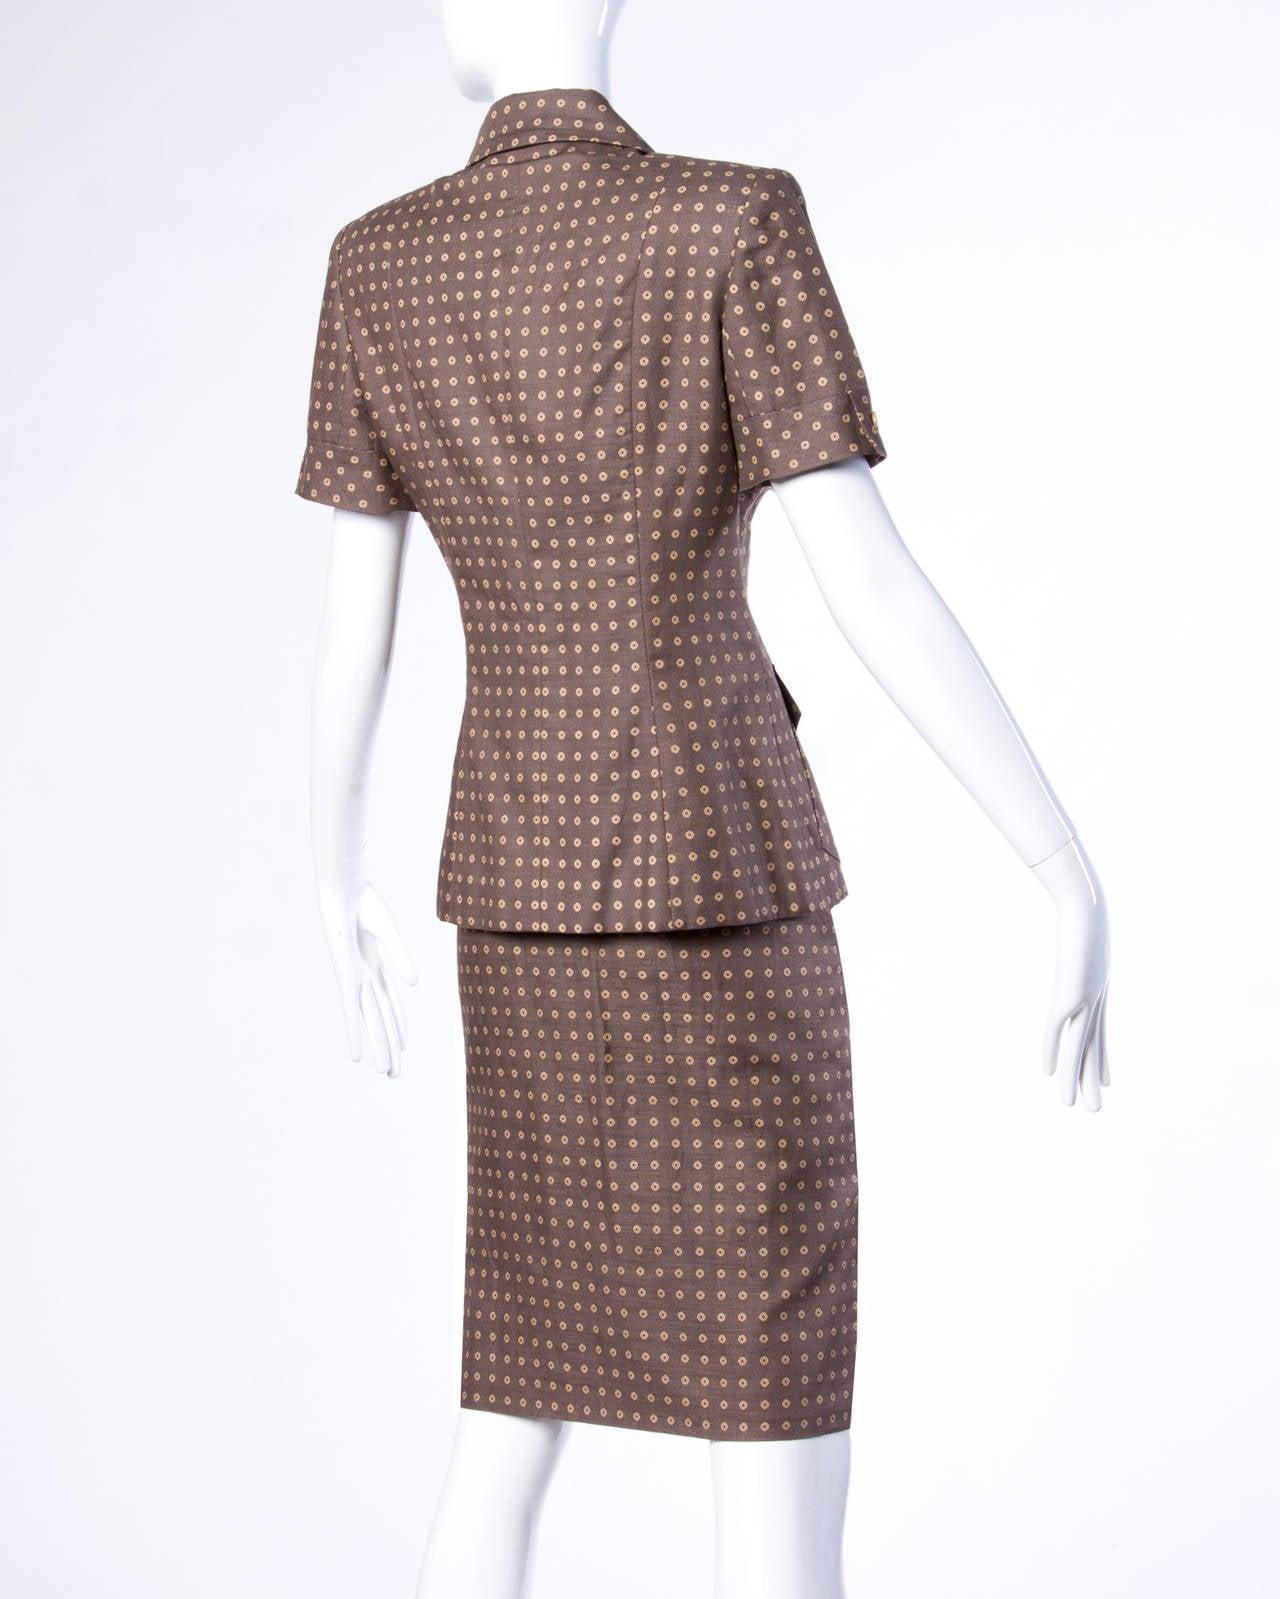 Gray Bill Blass Unworn Deadstock Vintage Wool Jacket + Skirt Suit For Sale